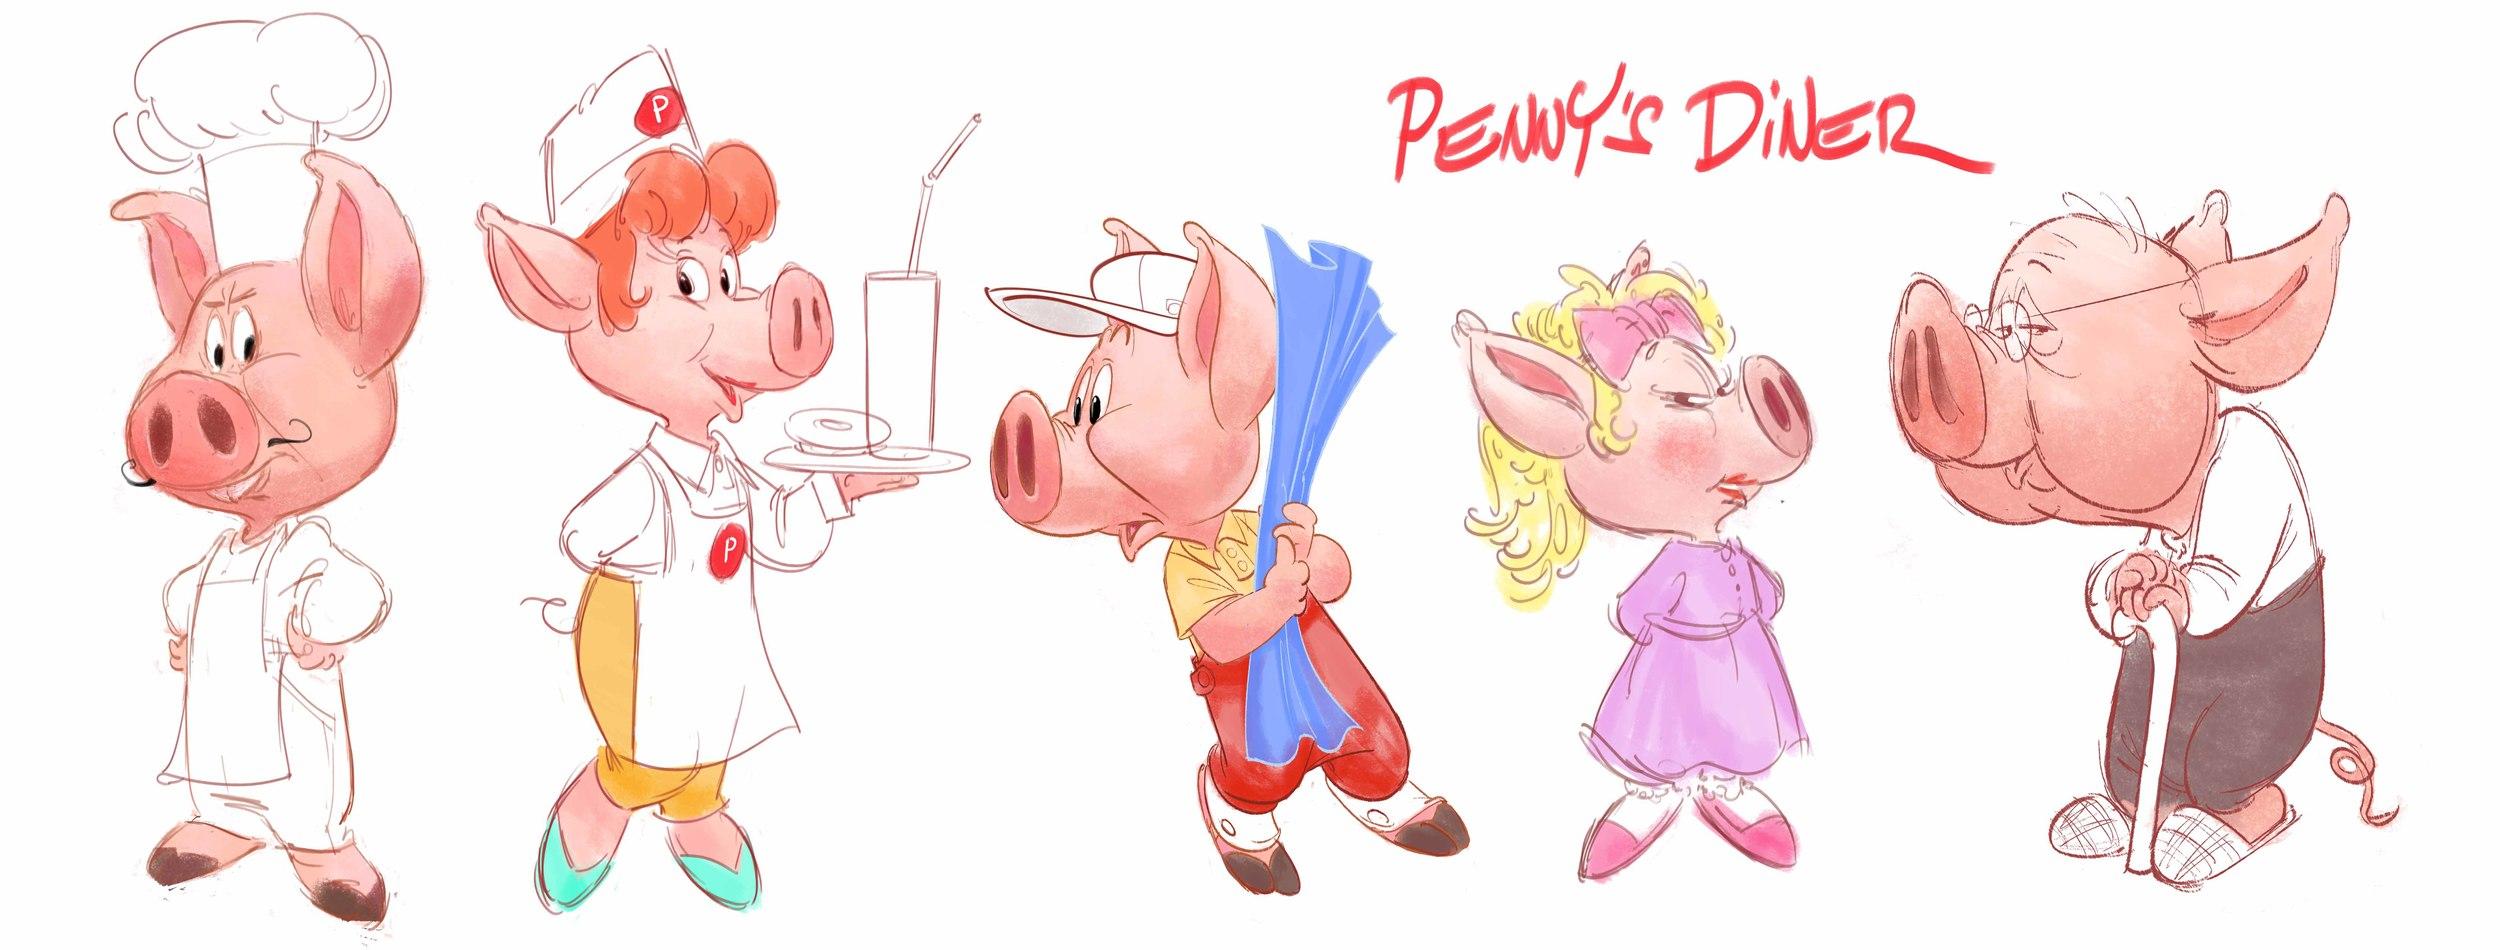 penny's diner.jpg